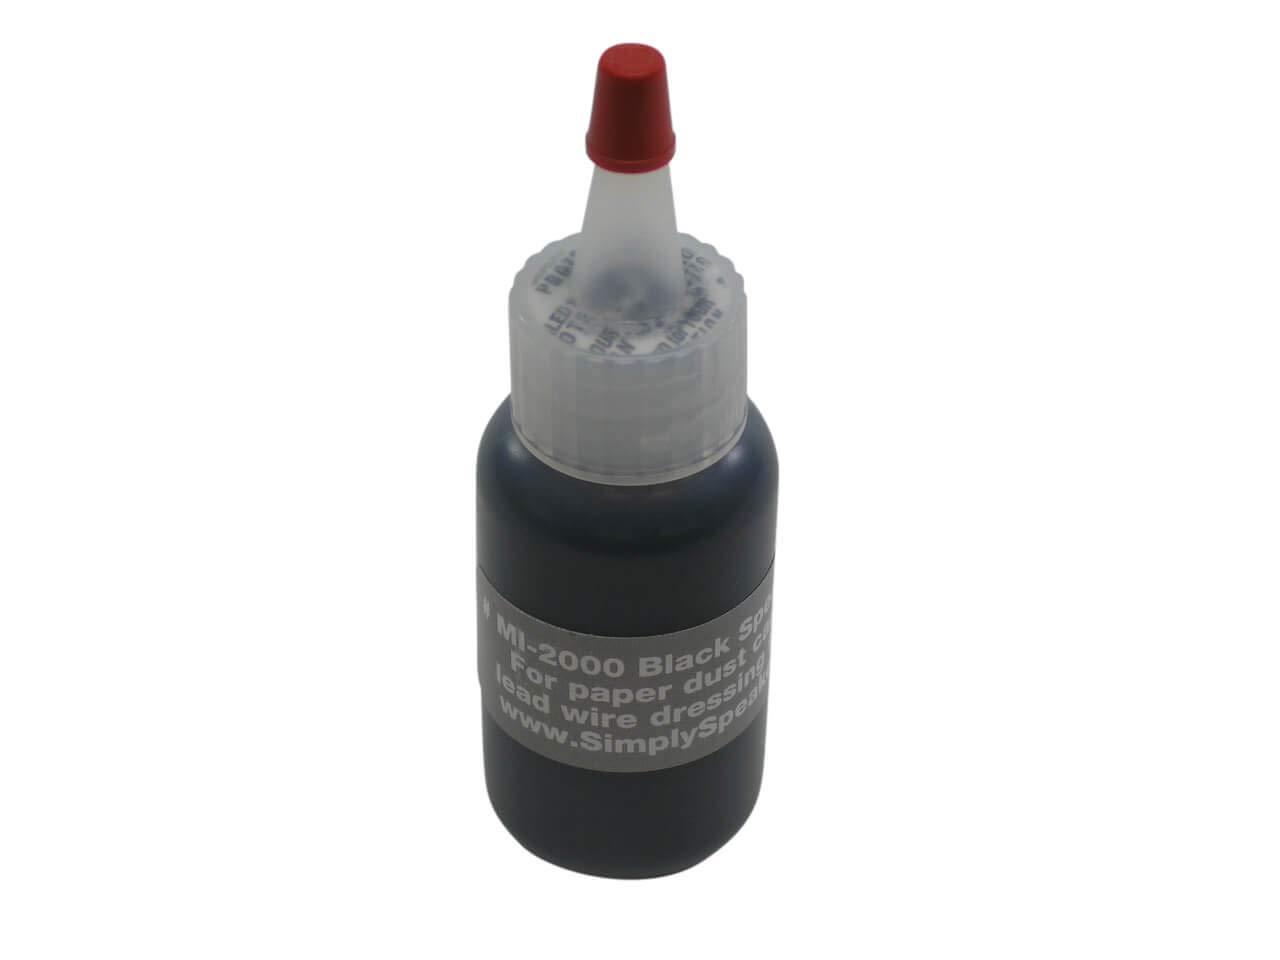 Speaker Repair Adhesive, Dust Cap, Leadwire Dress, Black, MI-2000